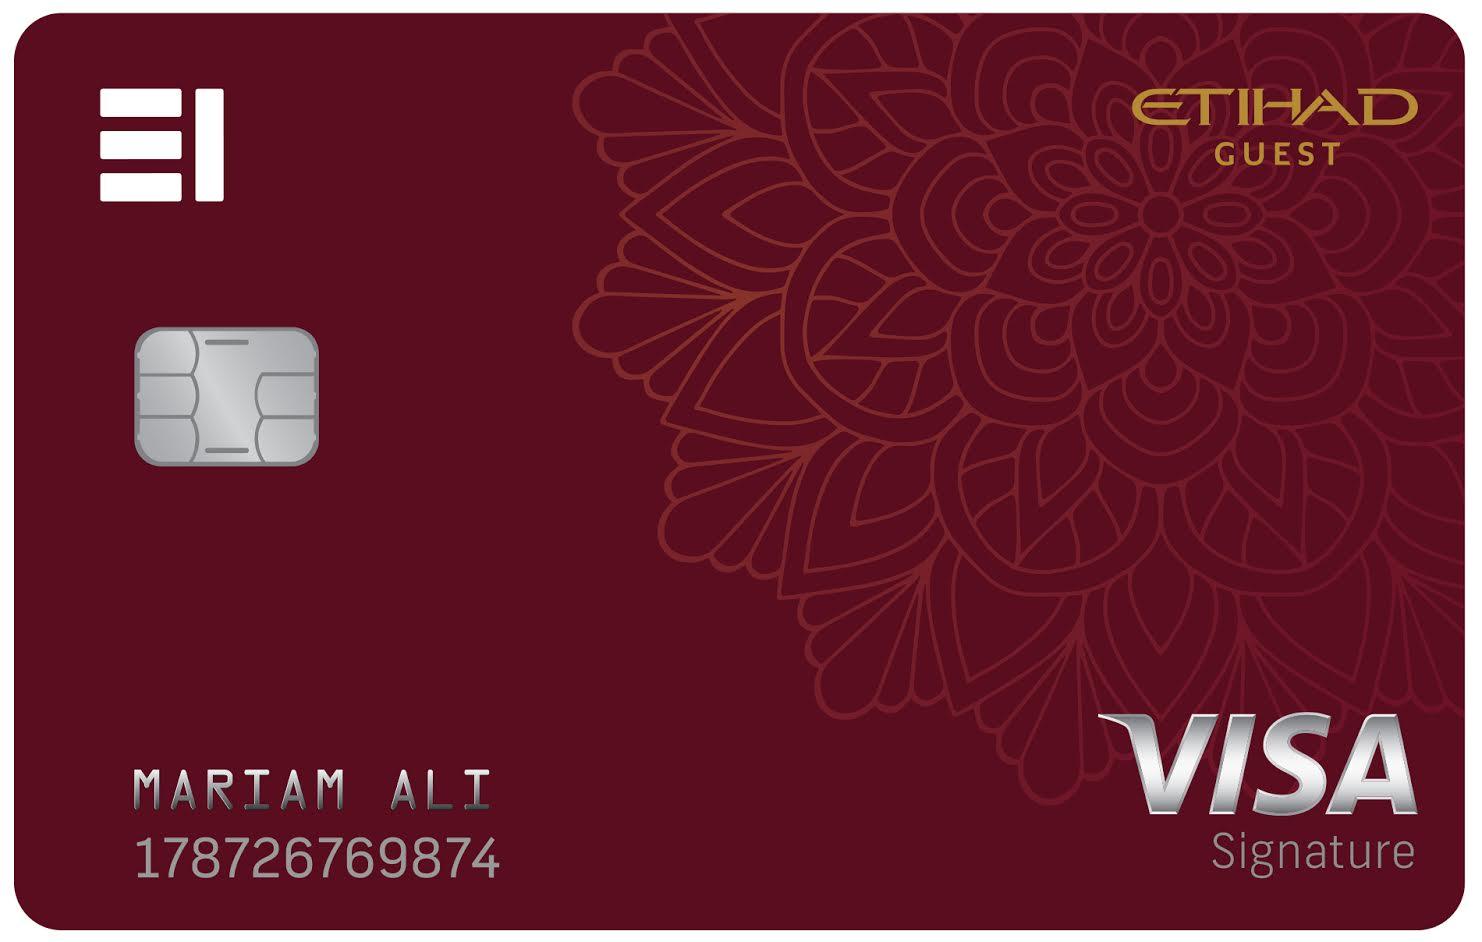 Emirates Islamic - Etihad Guest Ameera Credit Card